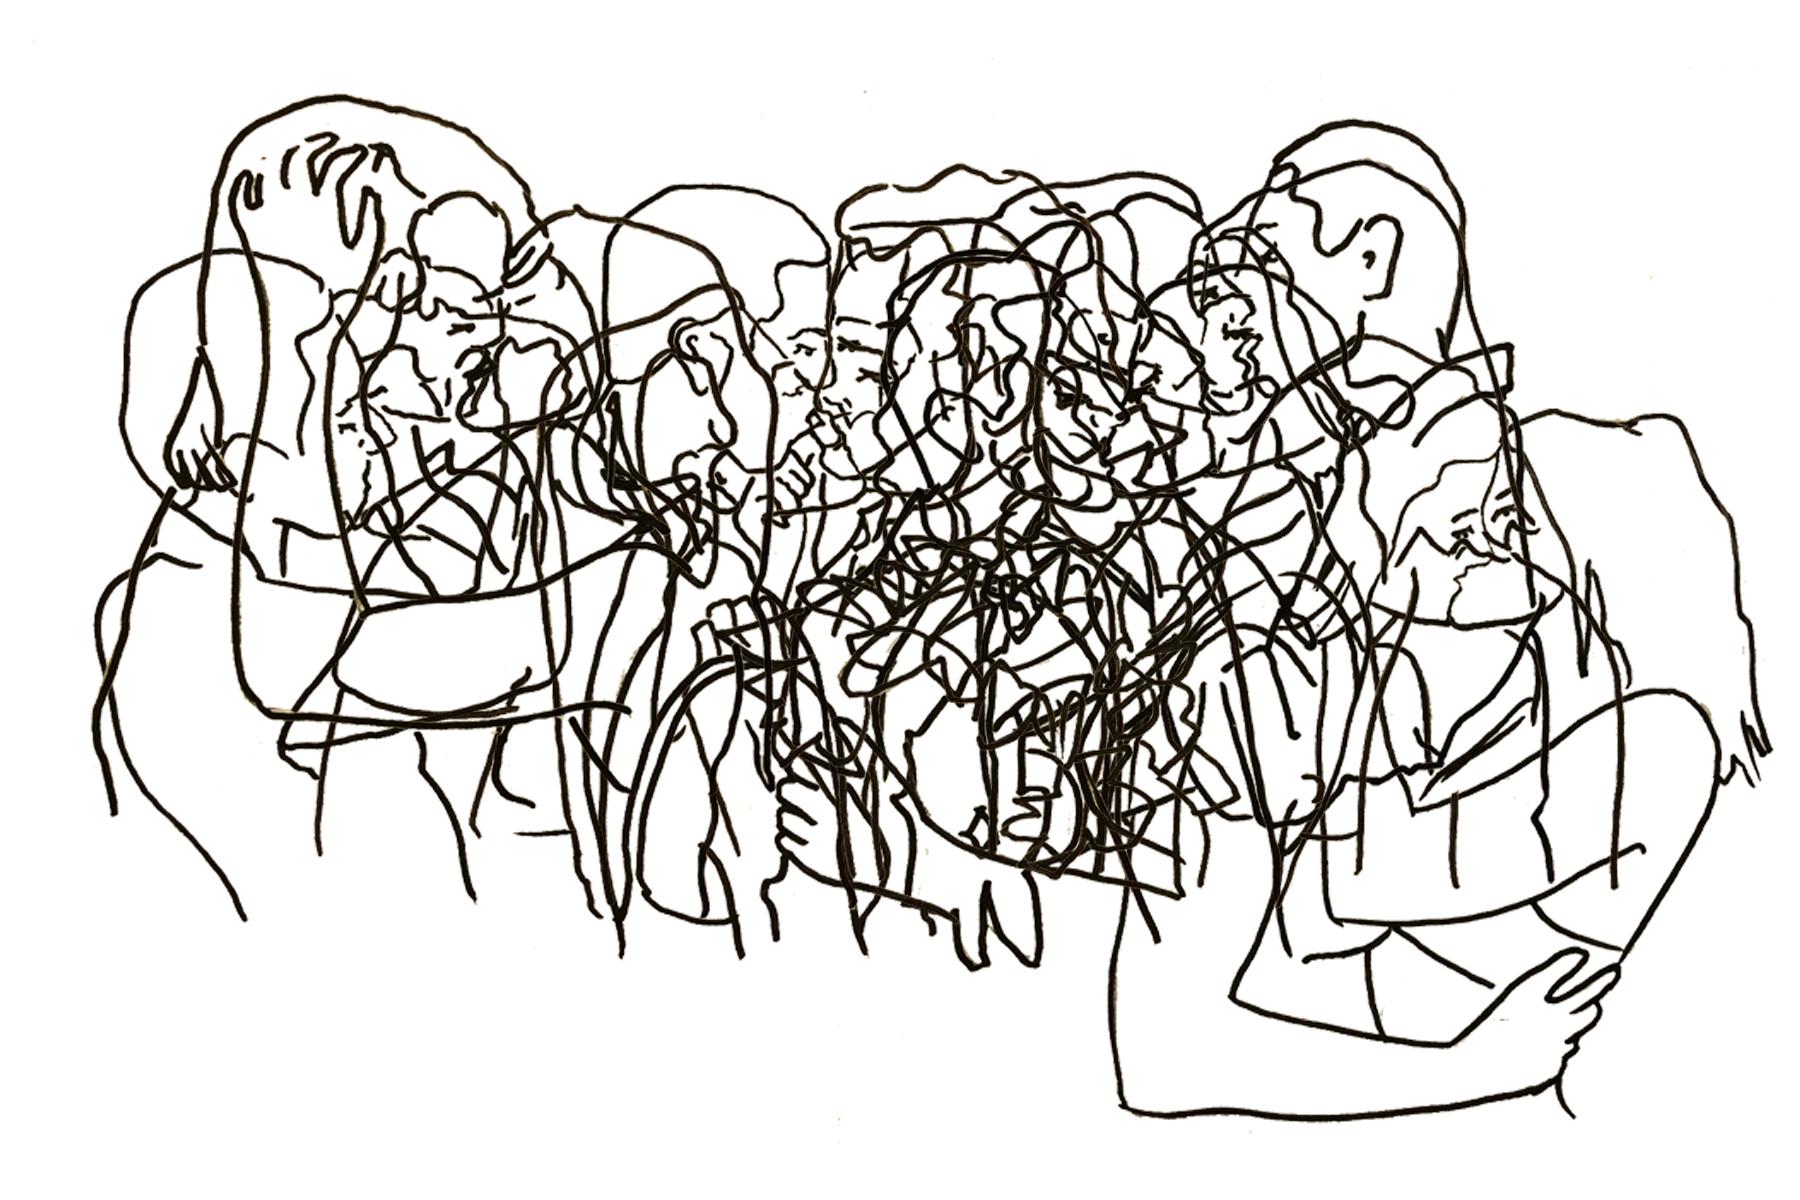 AbstractConcept.jpg